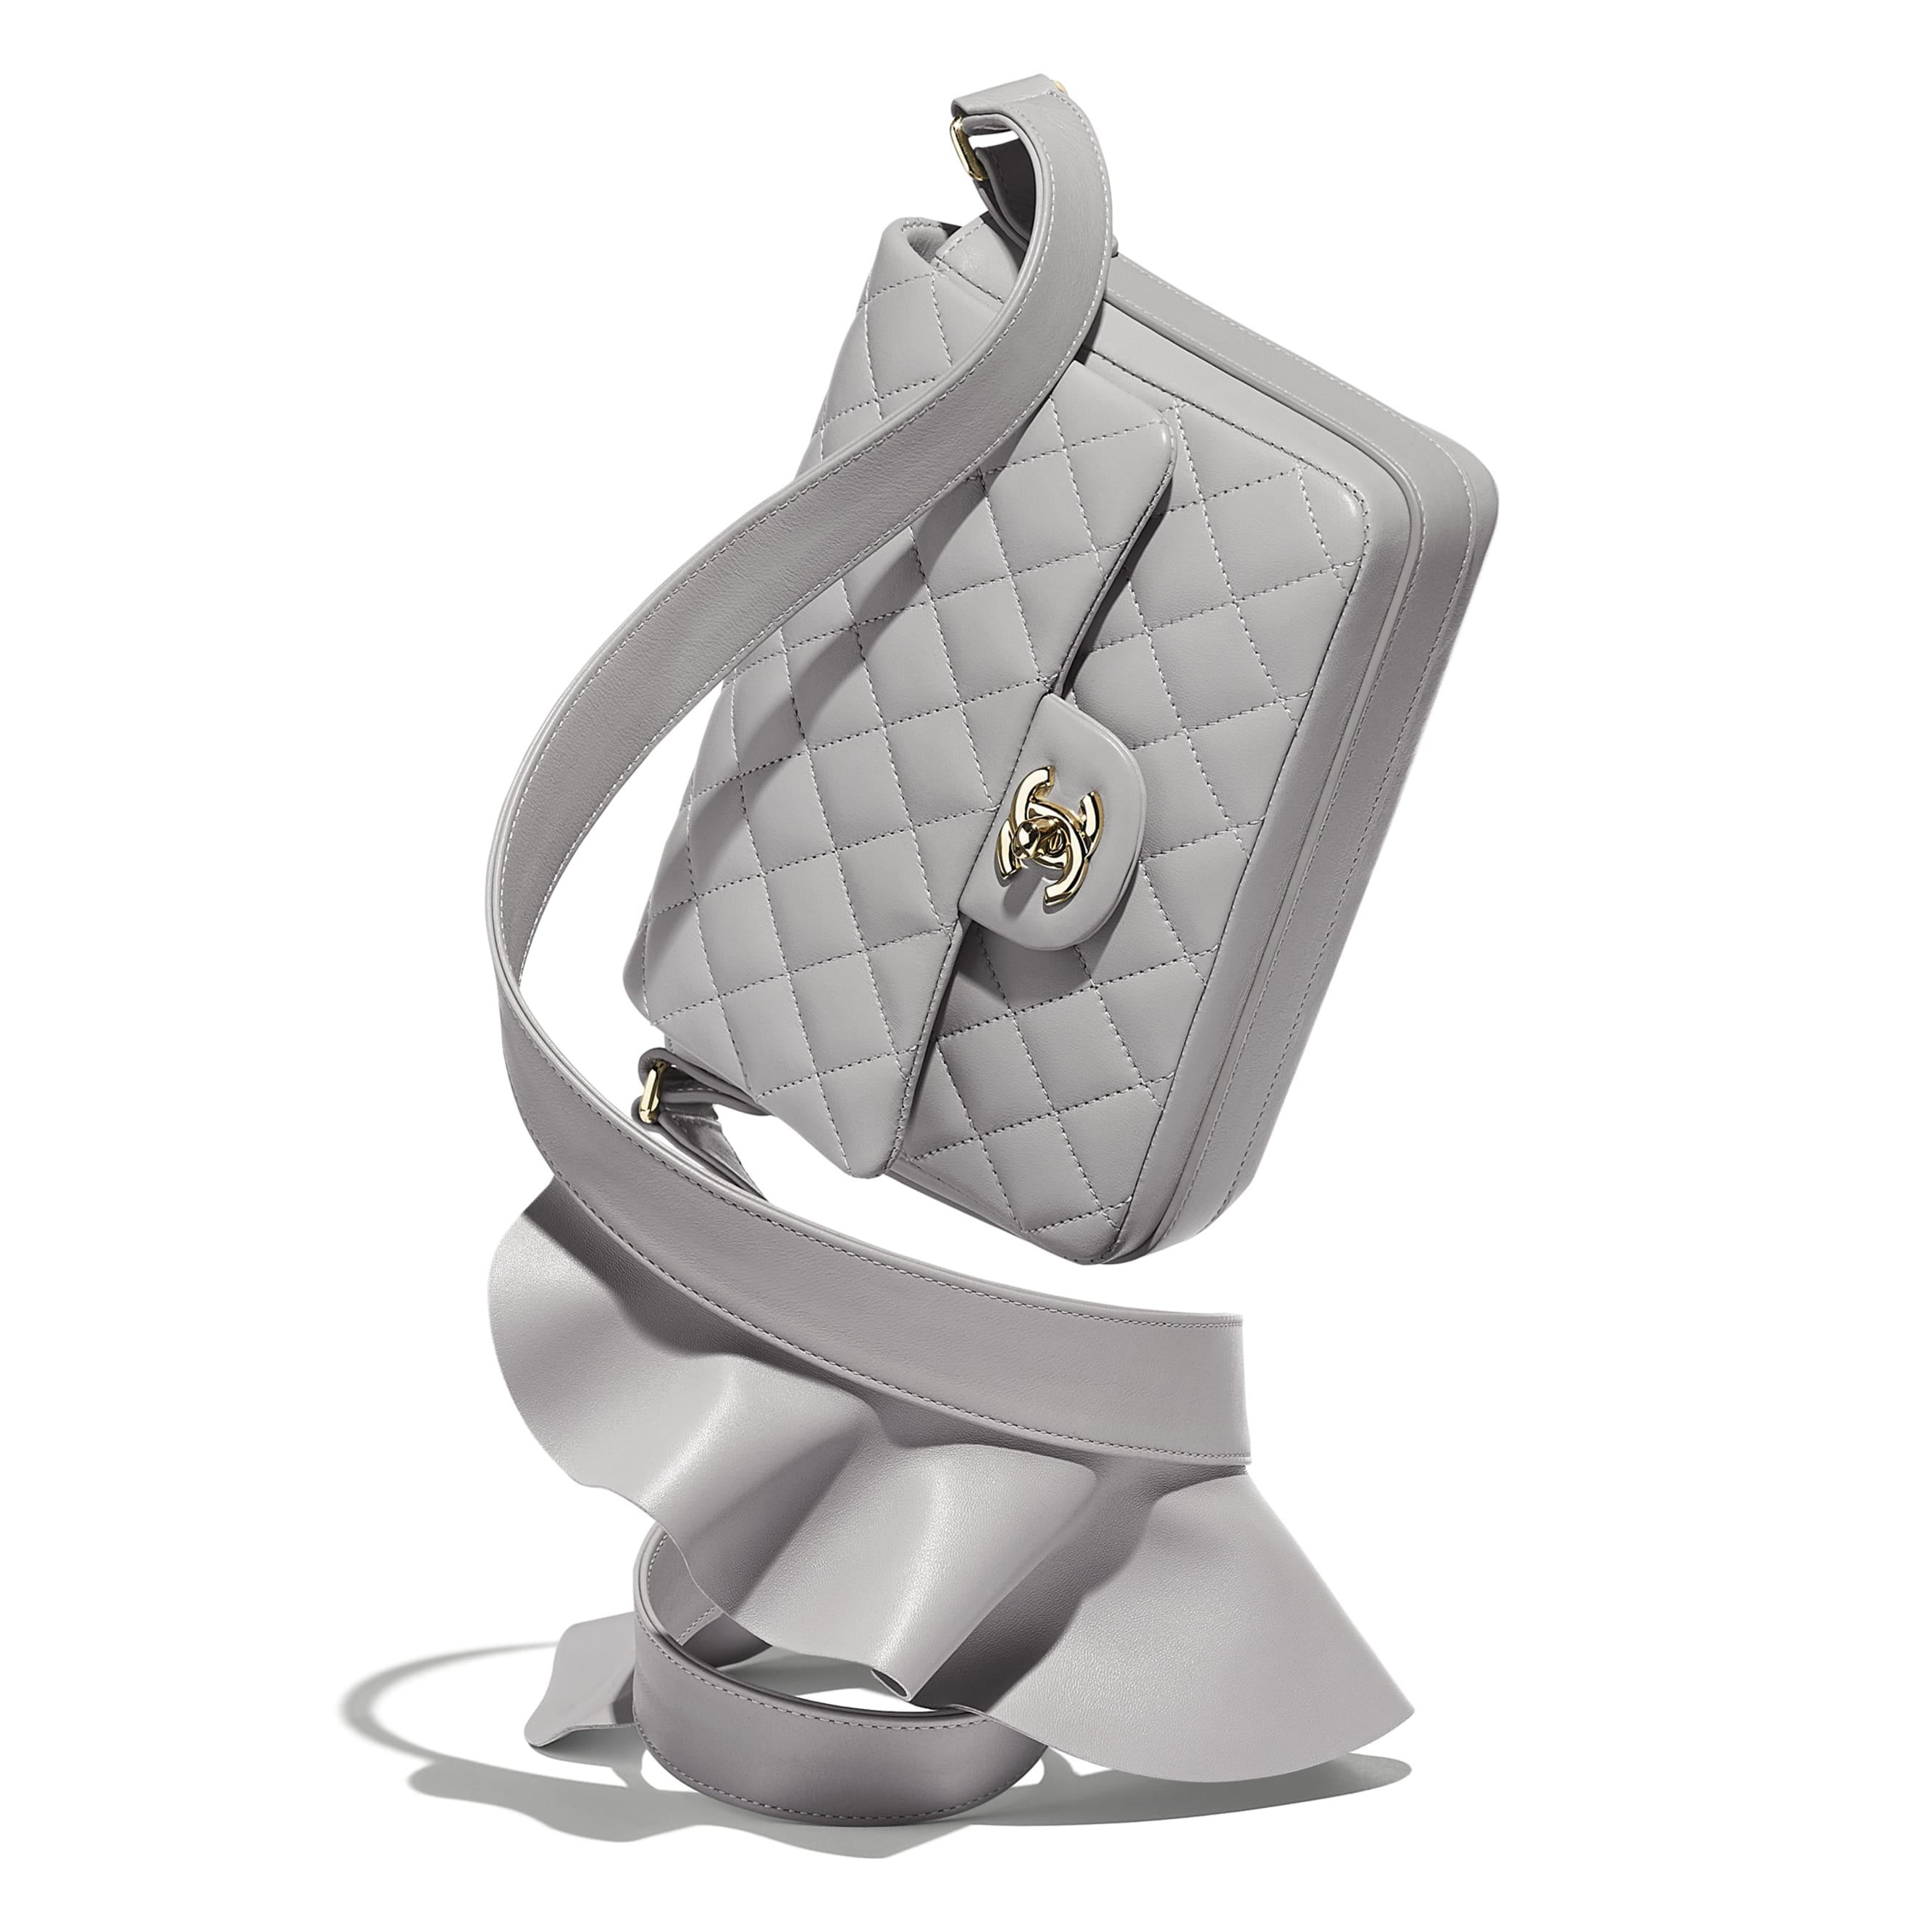 Flap Bag - Light Grey - Lambskin, Calfskin & Gold-Tone Metal - CHANEL - Extra view - see standard sized version